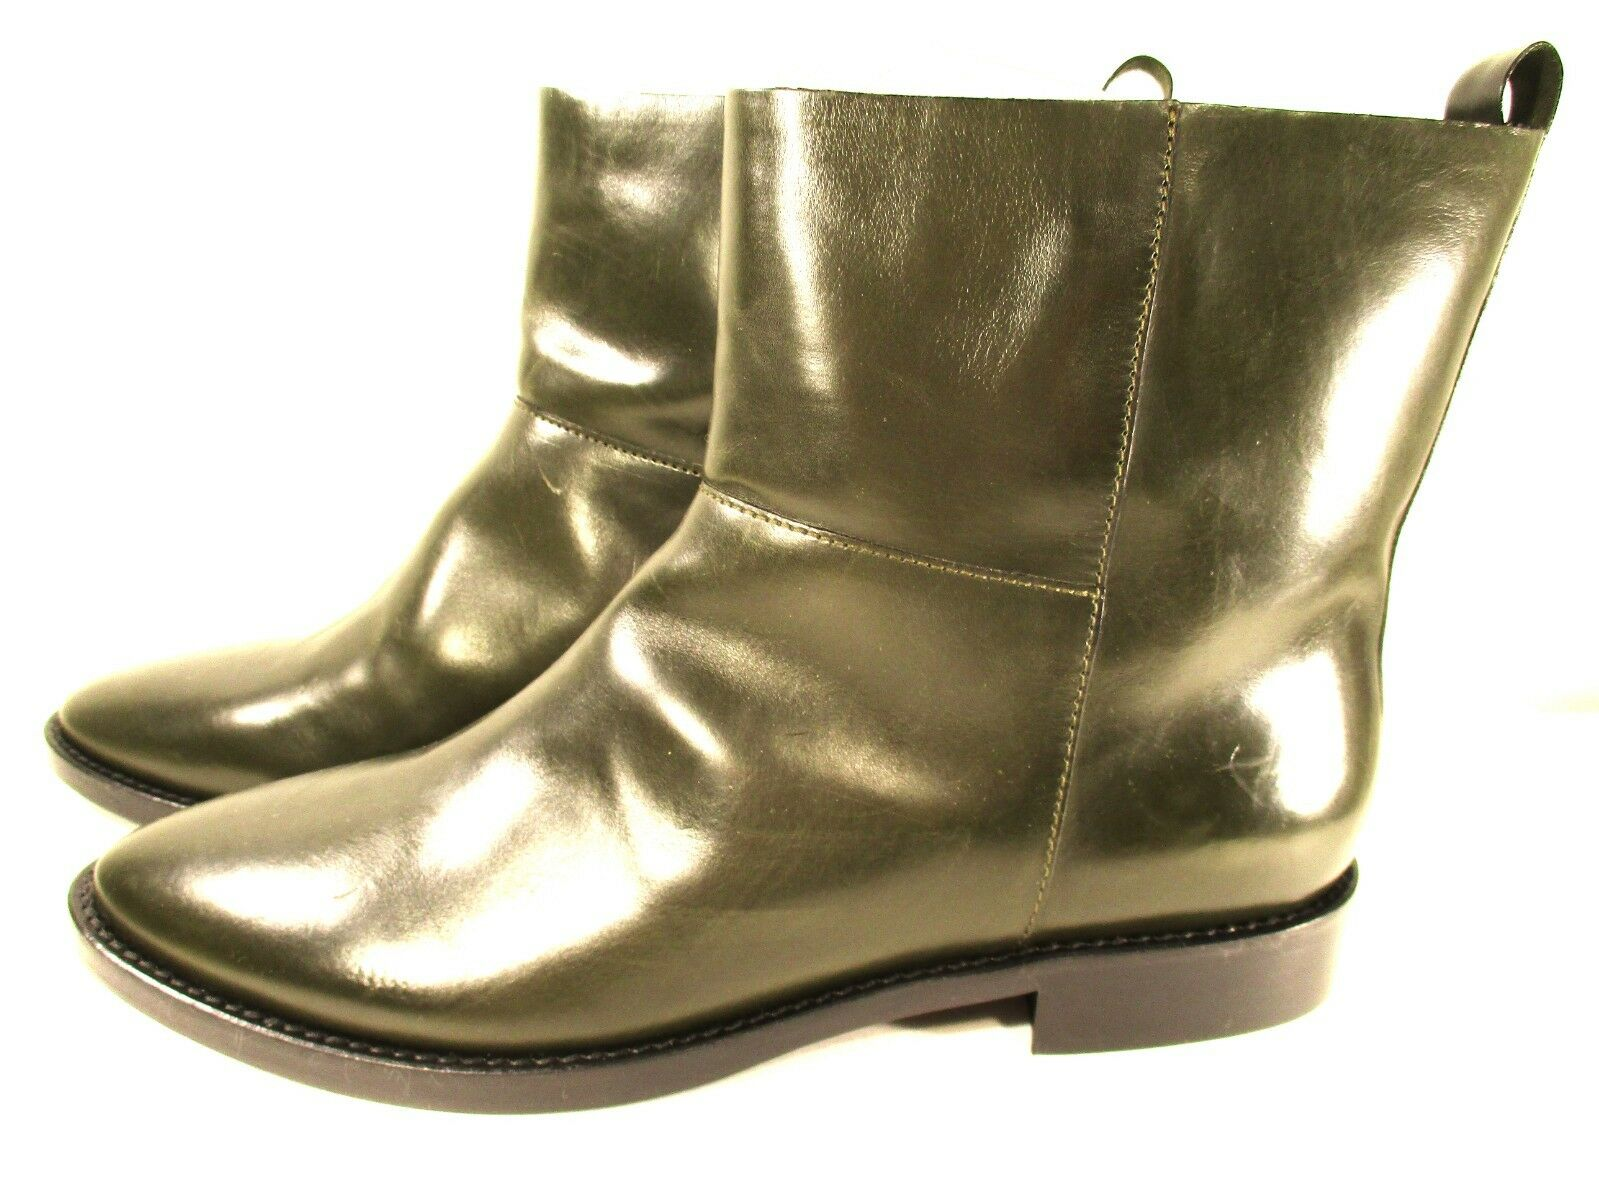 Theyskens' Theory Donna Flat Ankle Boots Sz 40 NWD 595 KHAKI